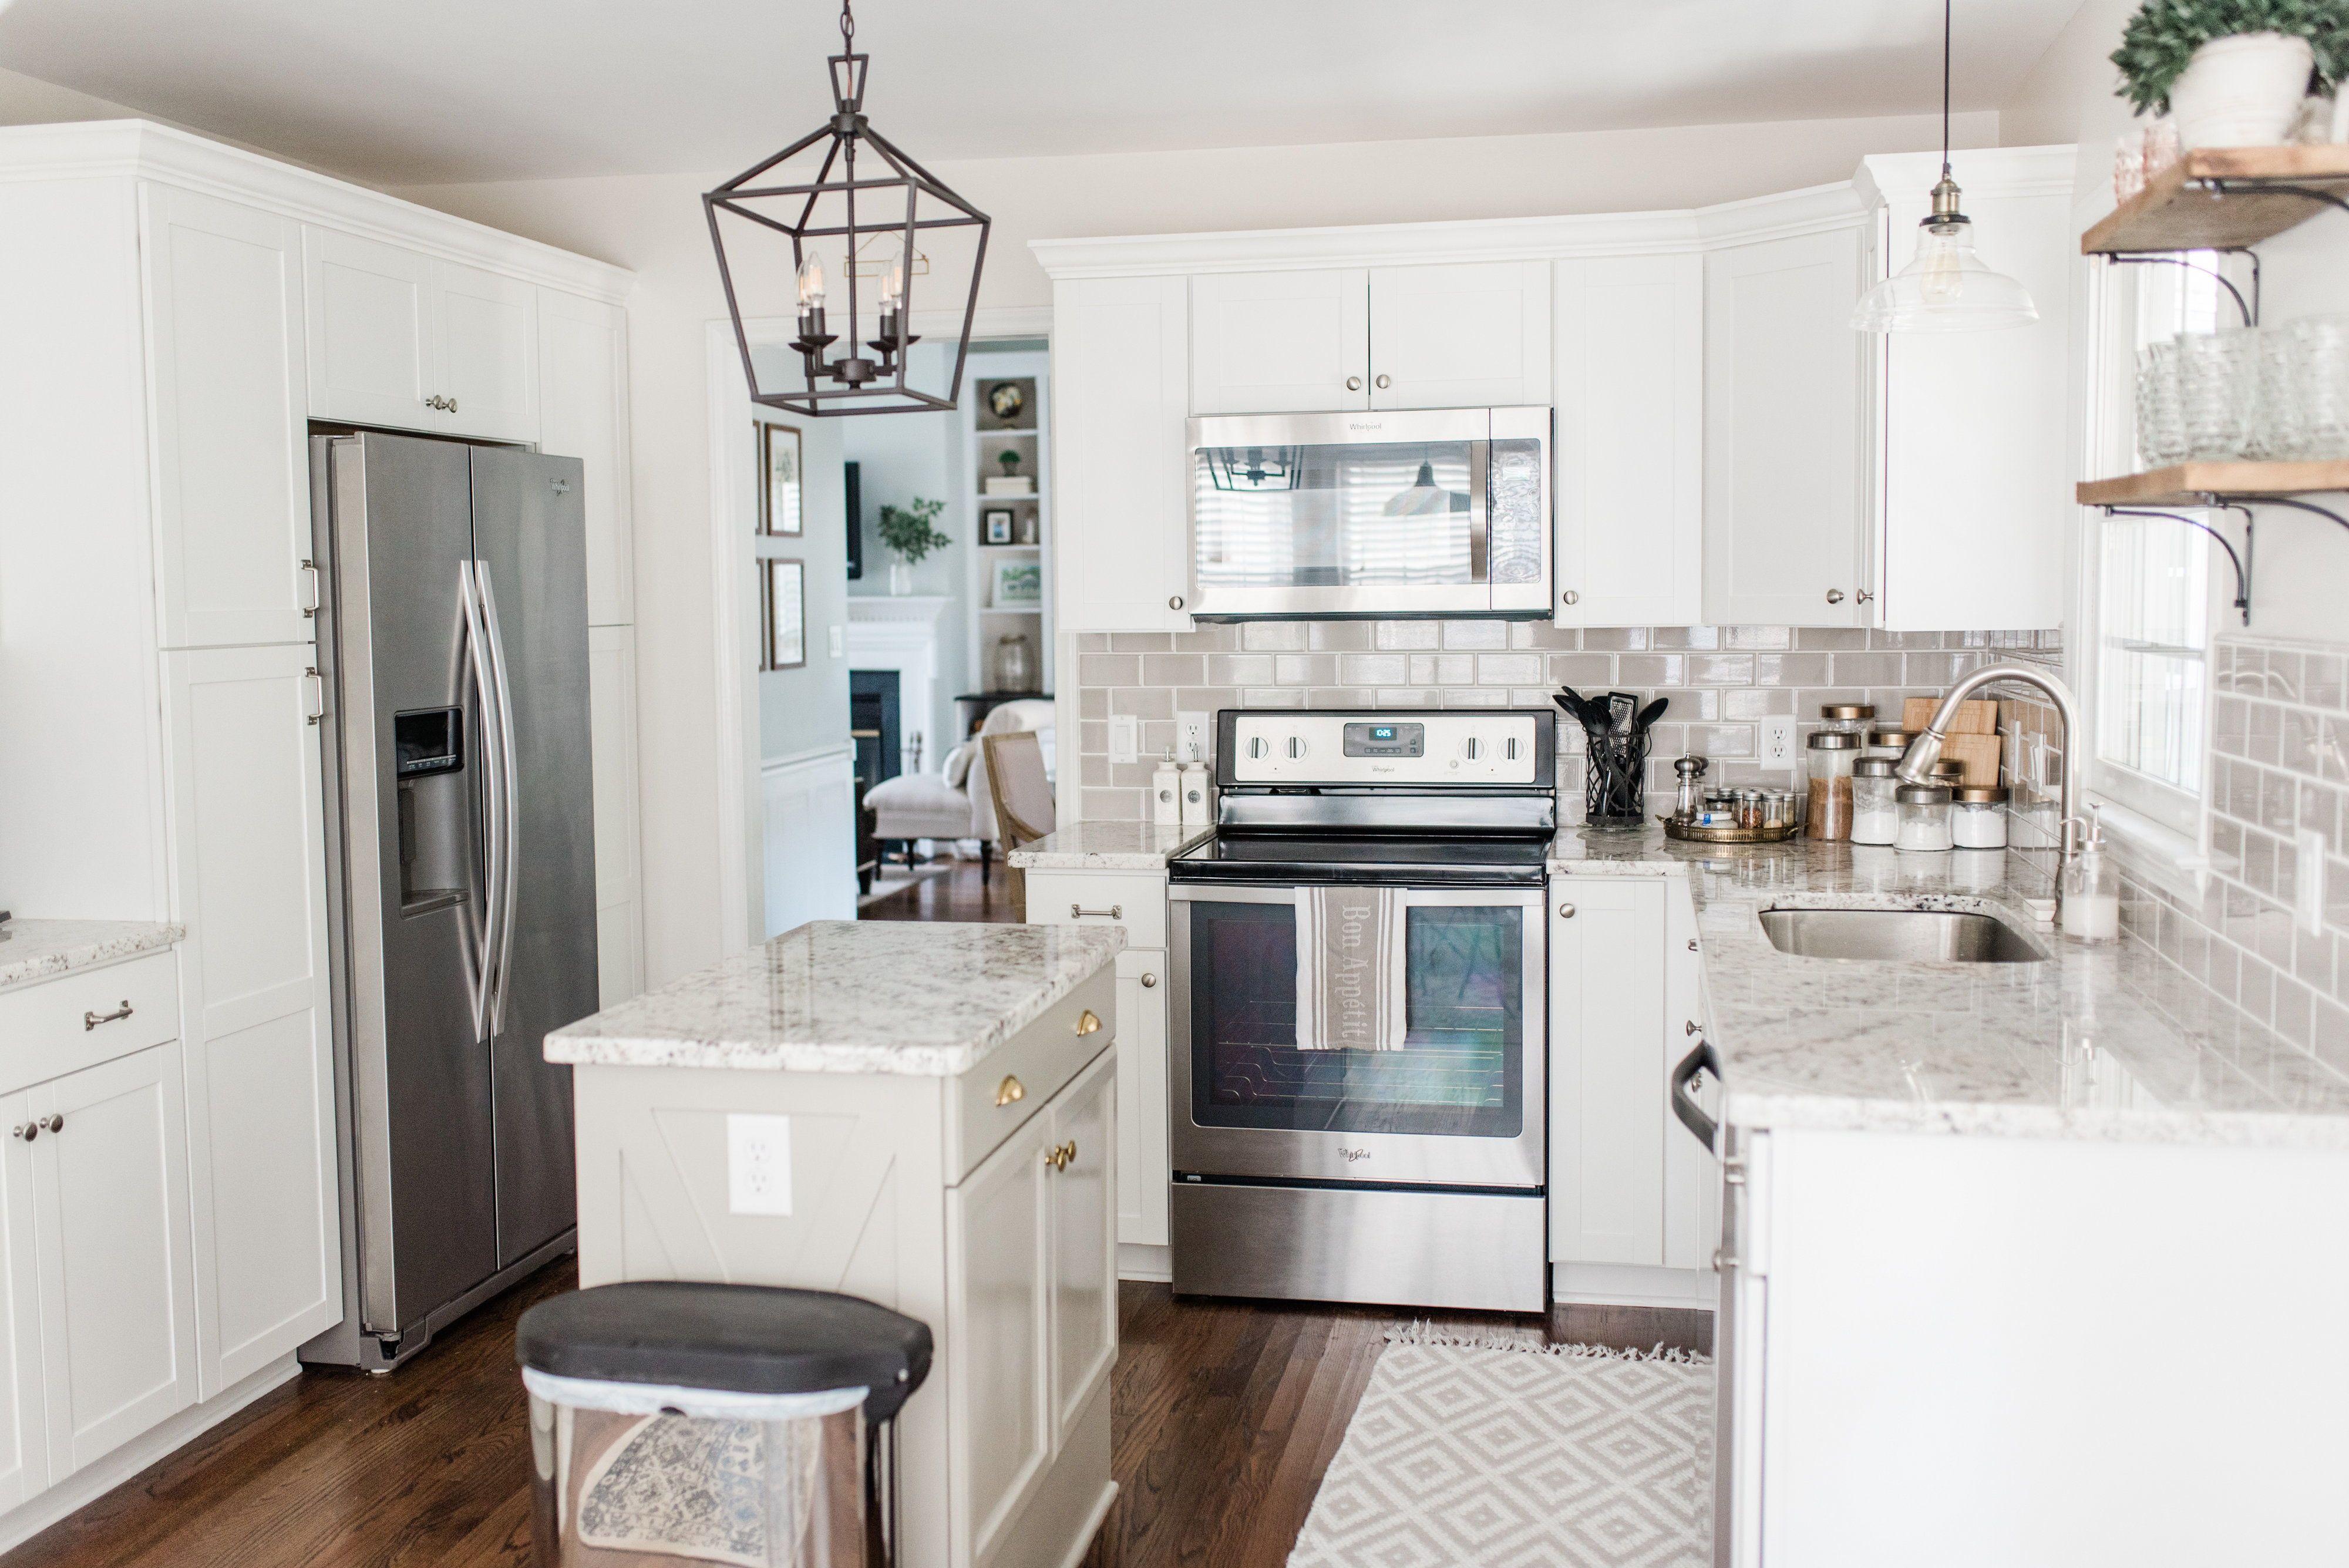 Denmead House Budget Kitchen Renovation Before And Afters Elizabeth Burns Design Raleigh Nc Interior Designer In 2020 Cottage Kitchen Design Cheap Cabinets Diy Kitchen